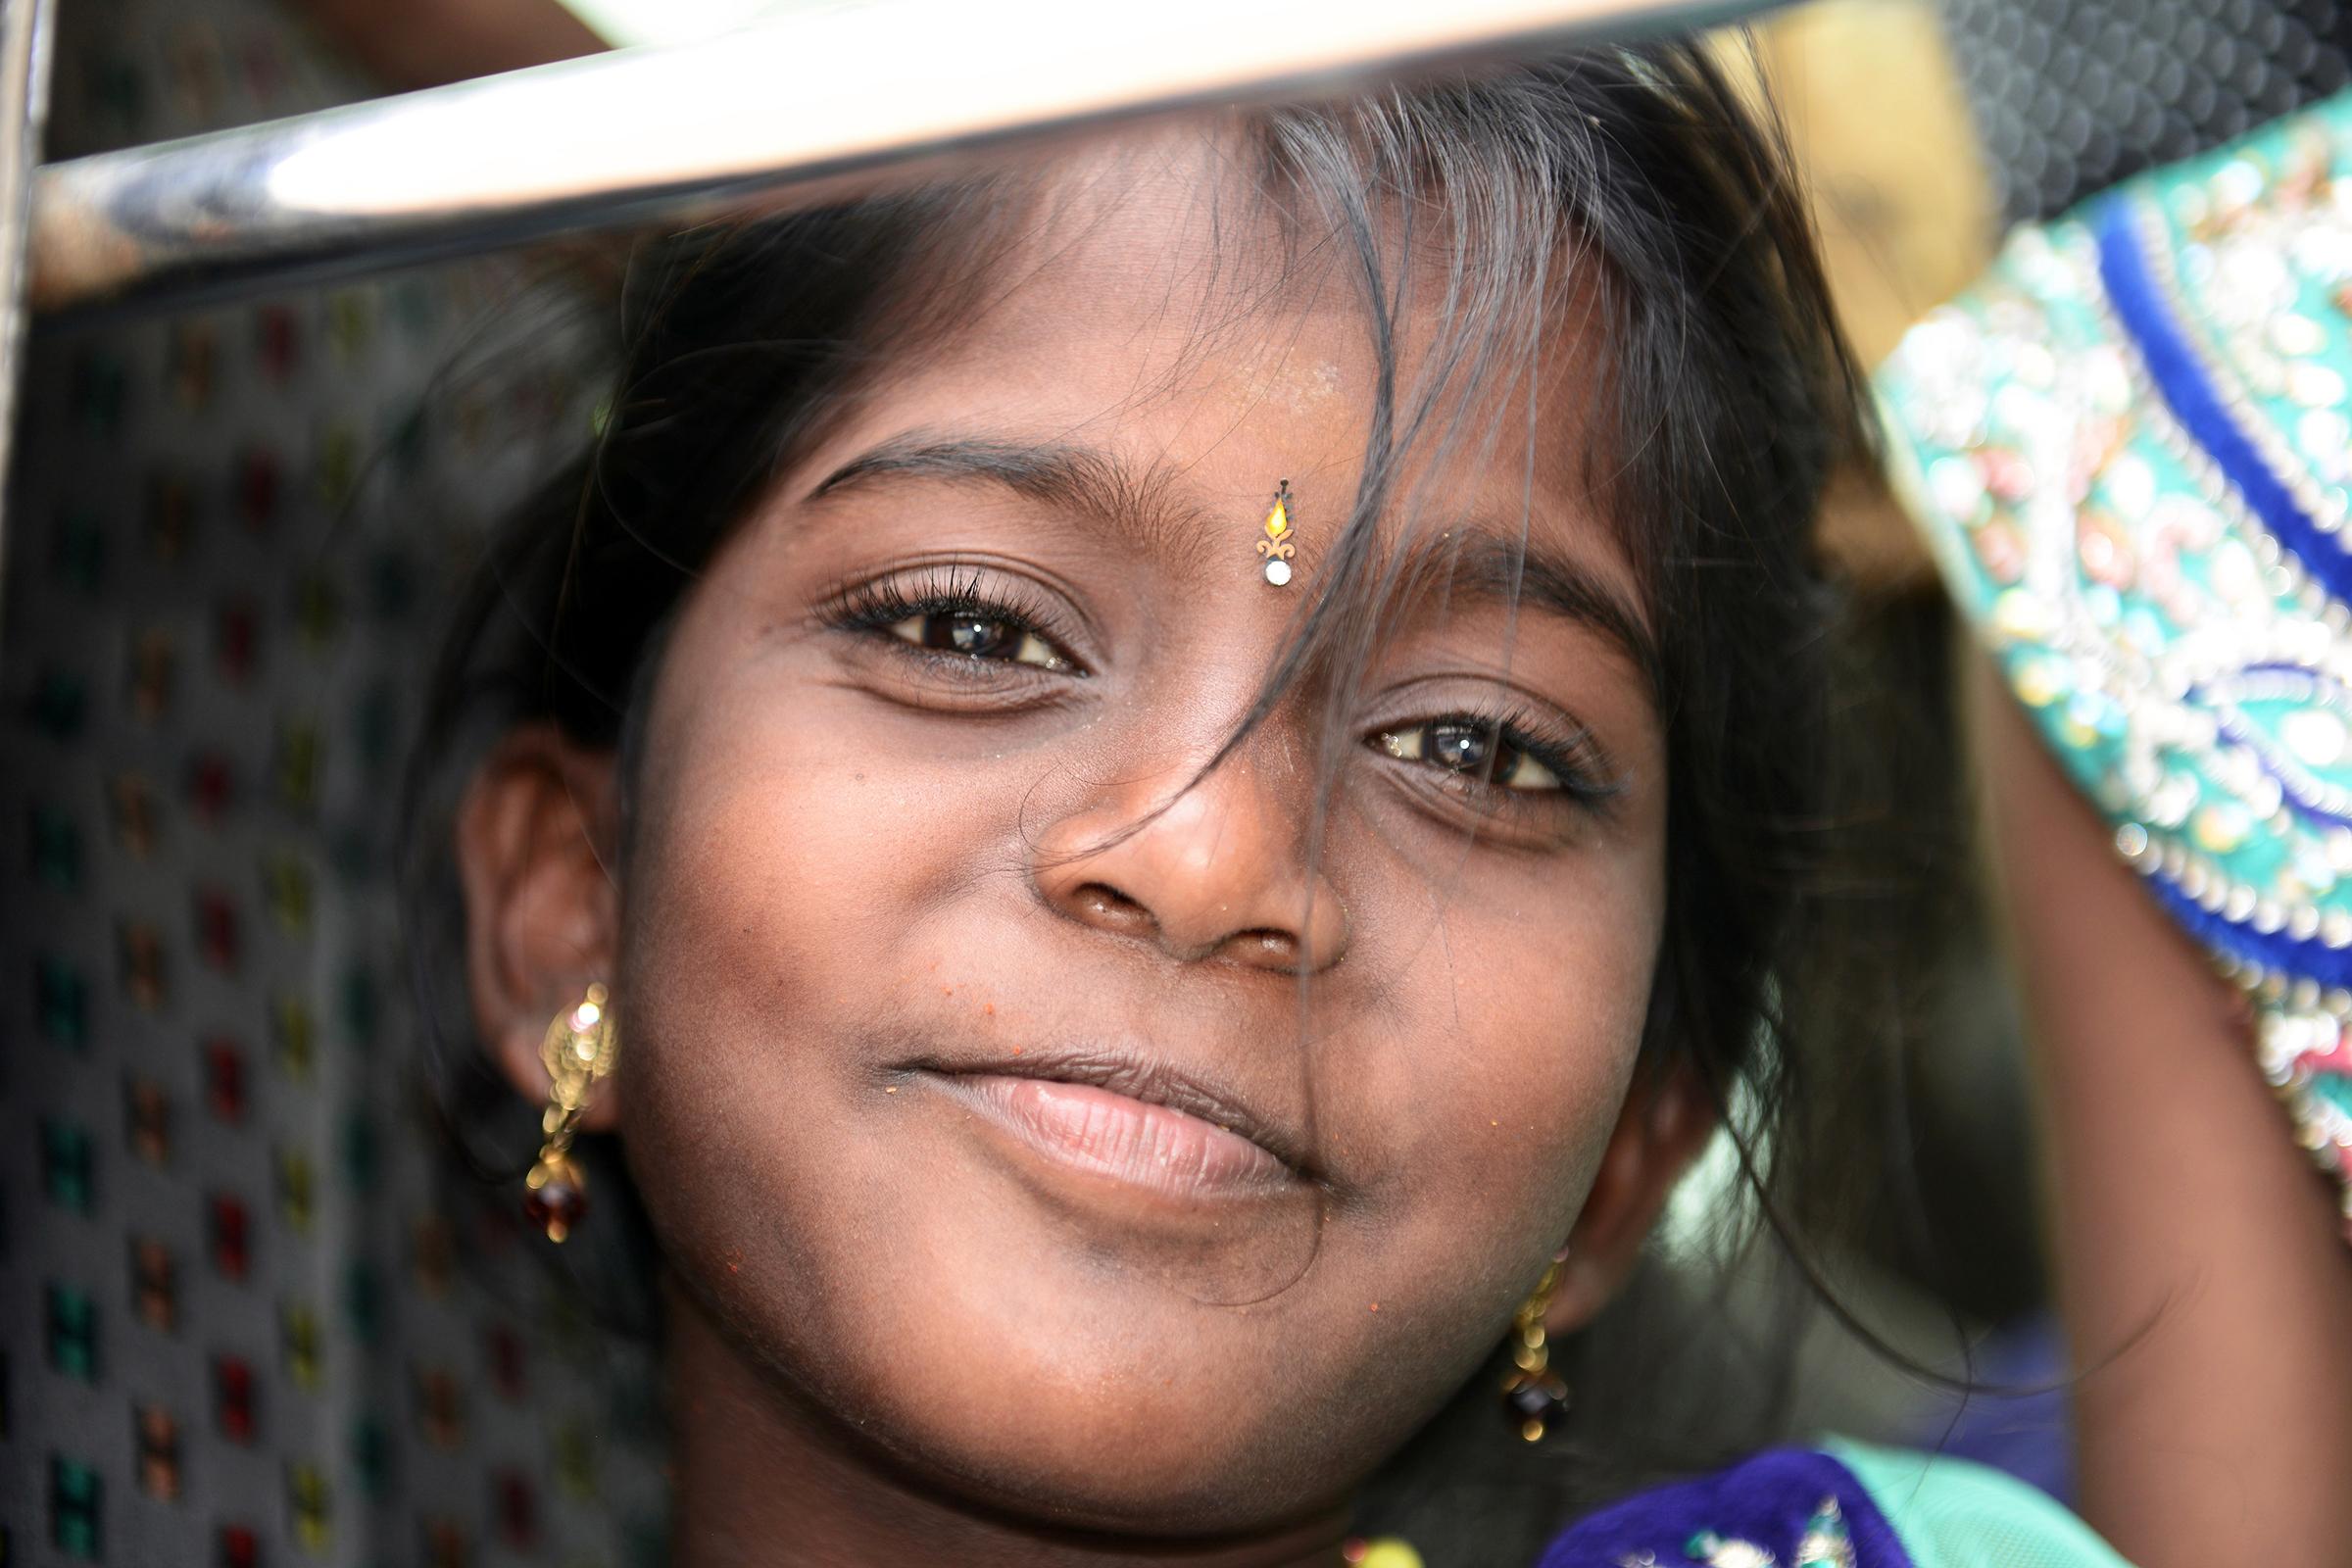 Dél-Indiai emberek